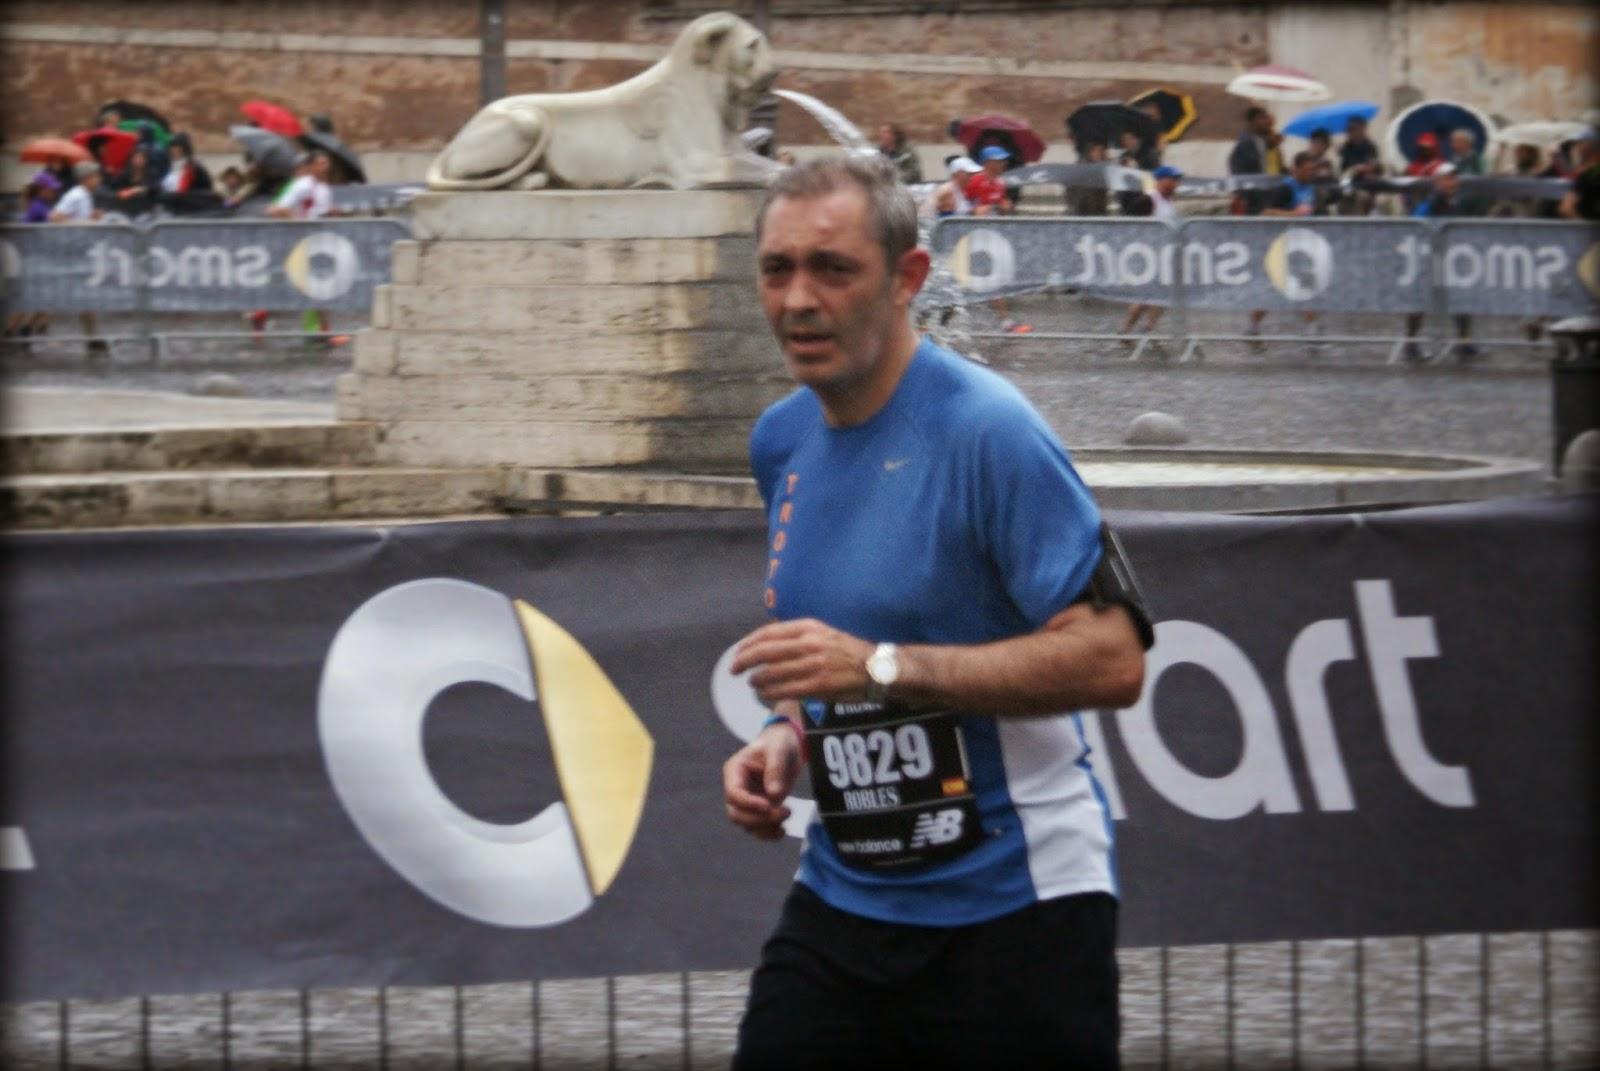 Maratón de Roma 2014 km39